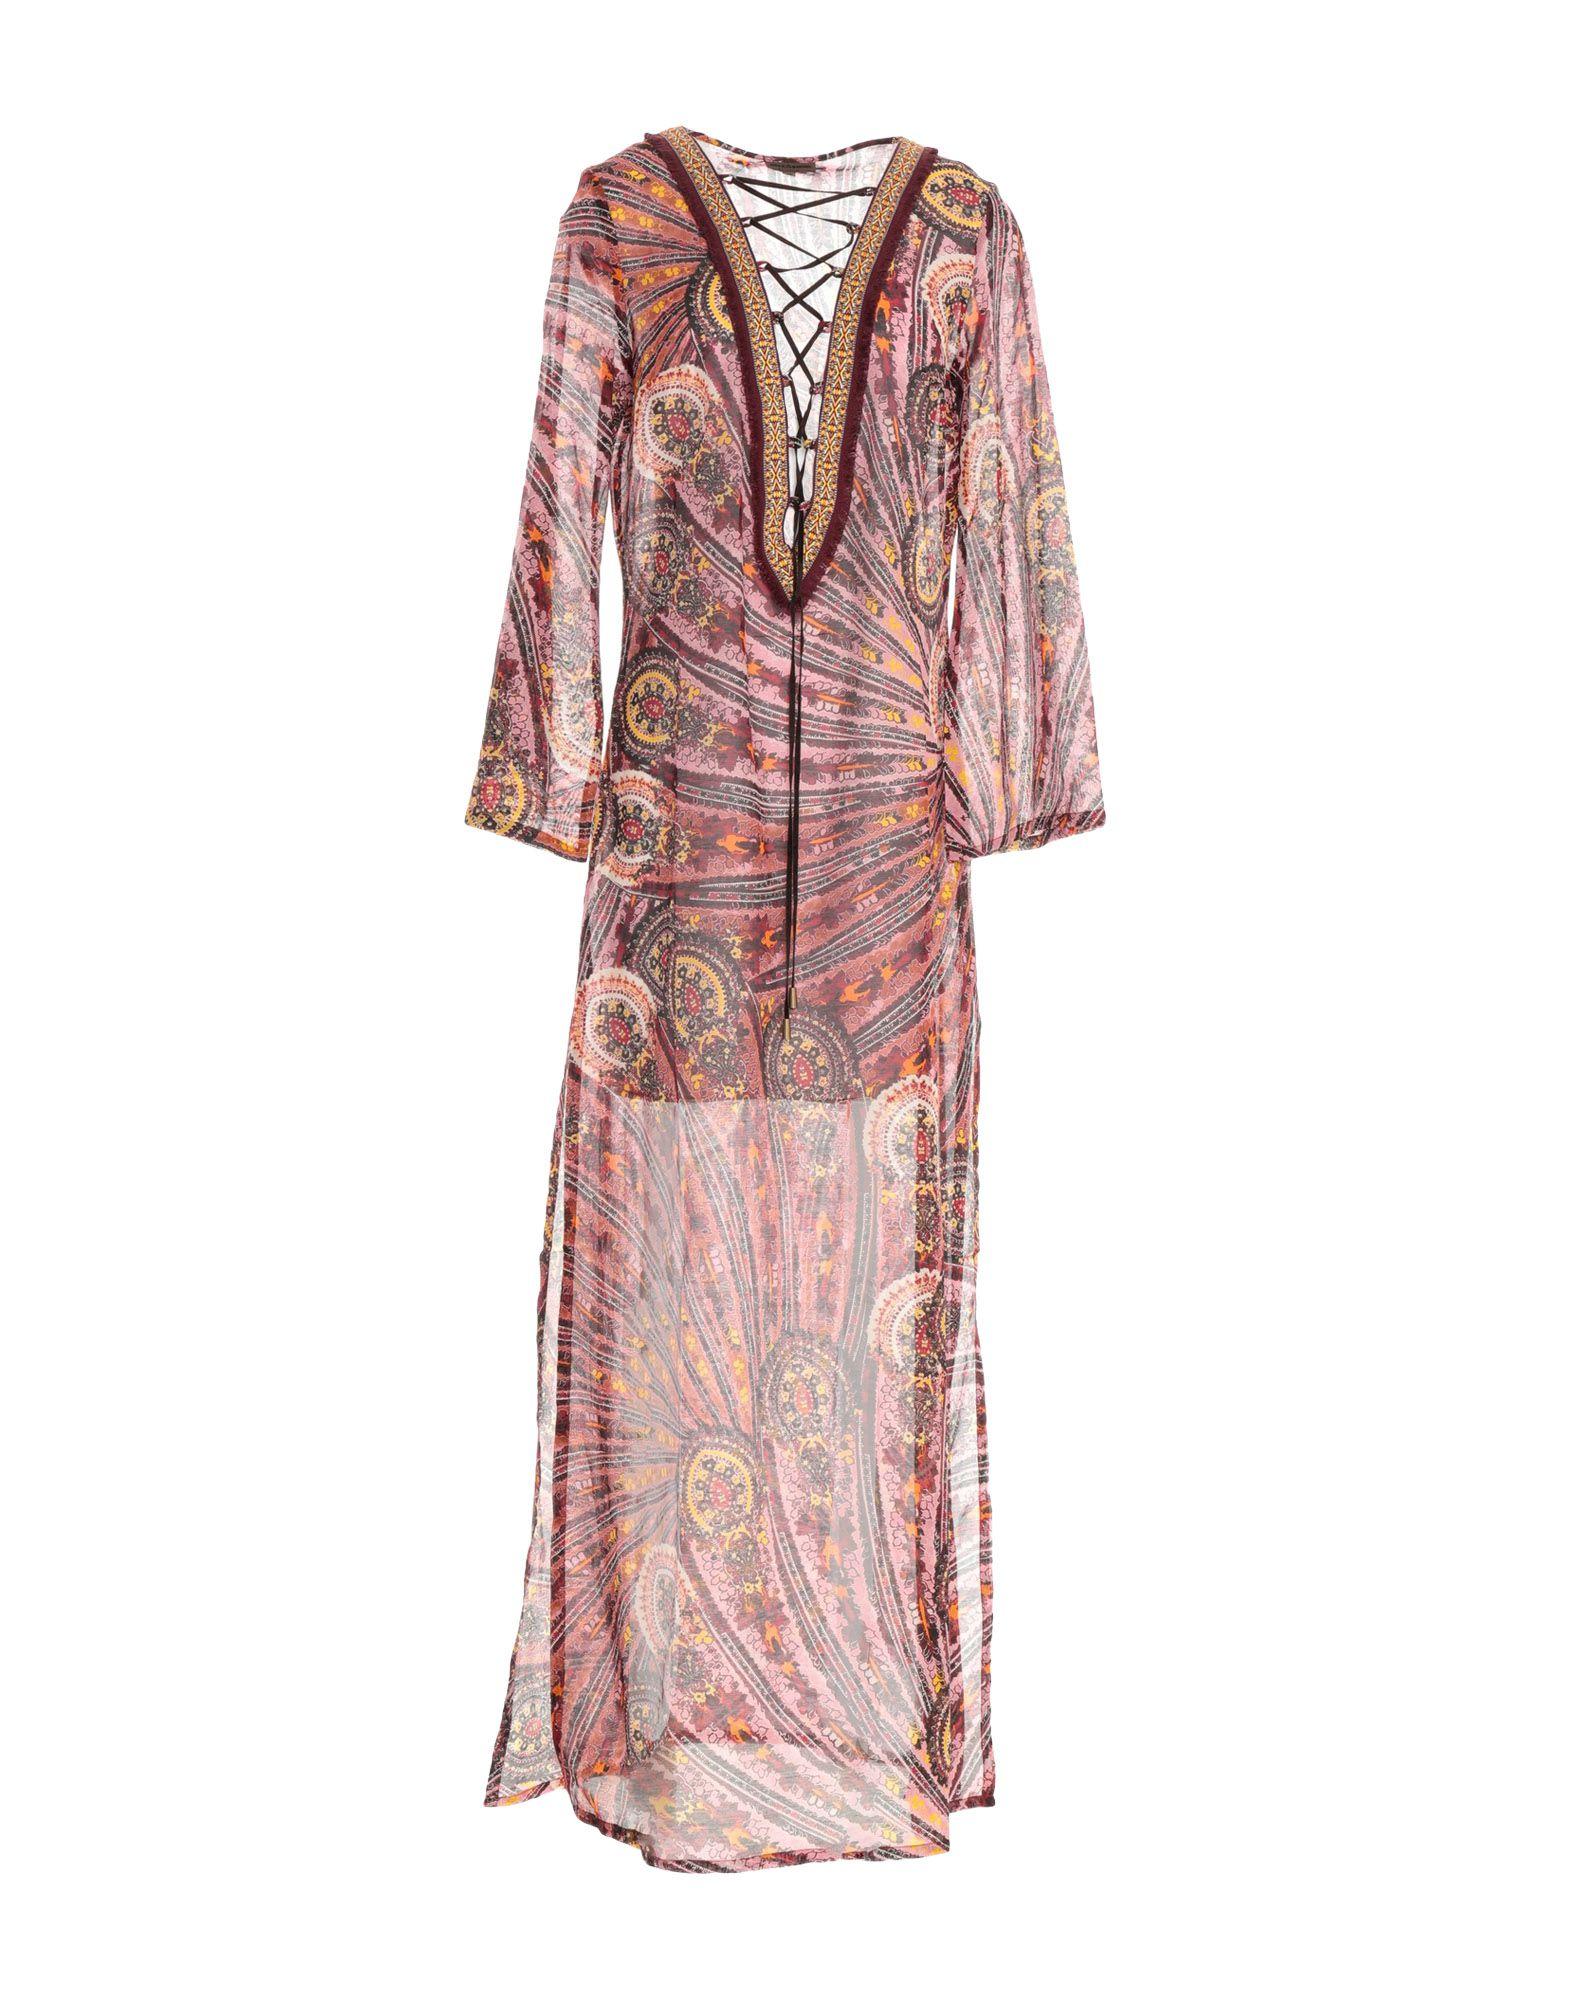 MISS BIKINI LUXE Длинное платье